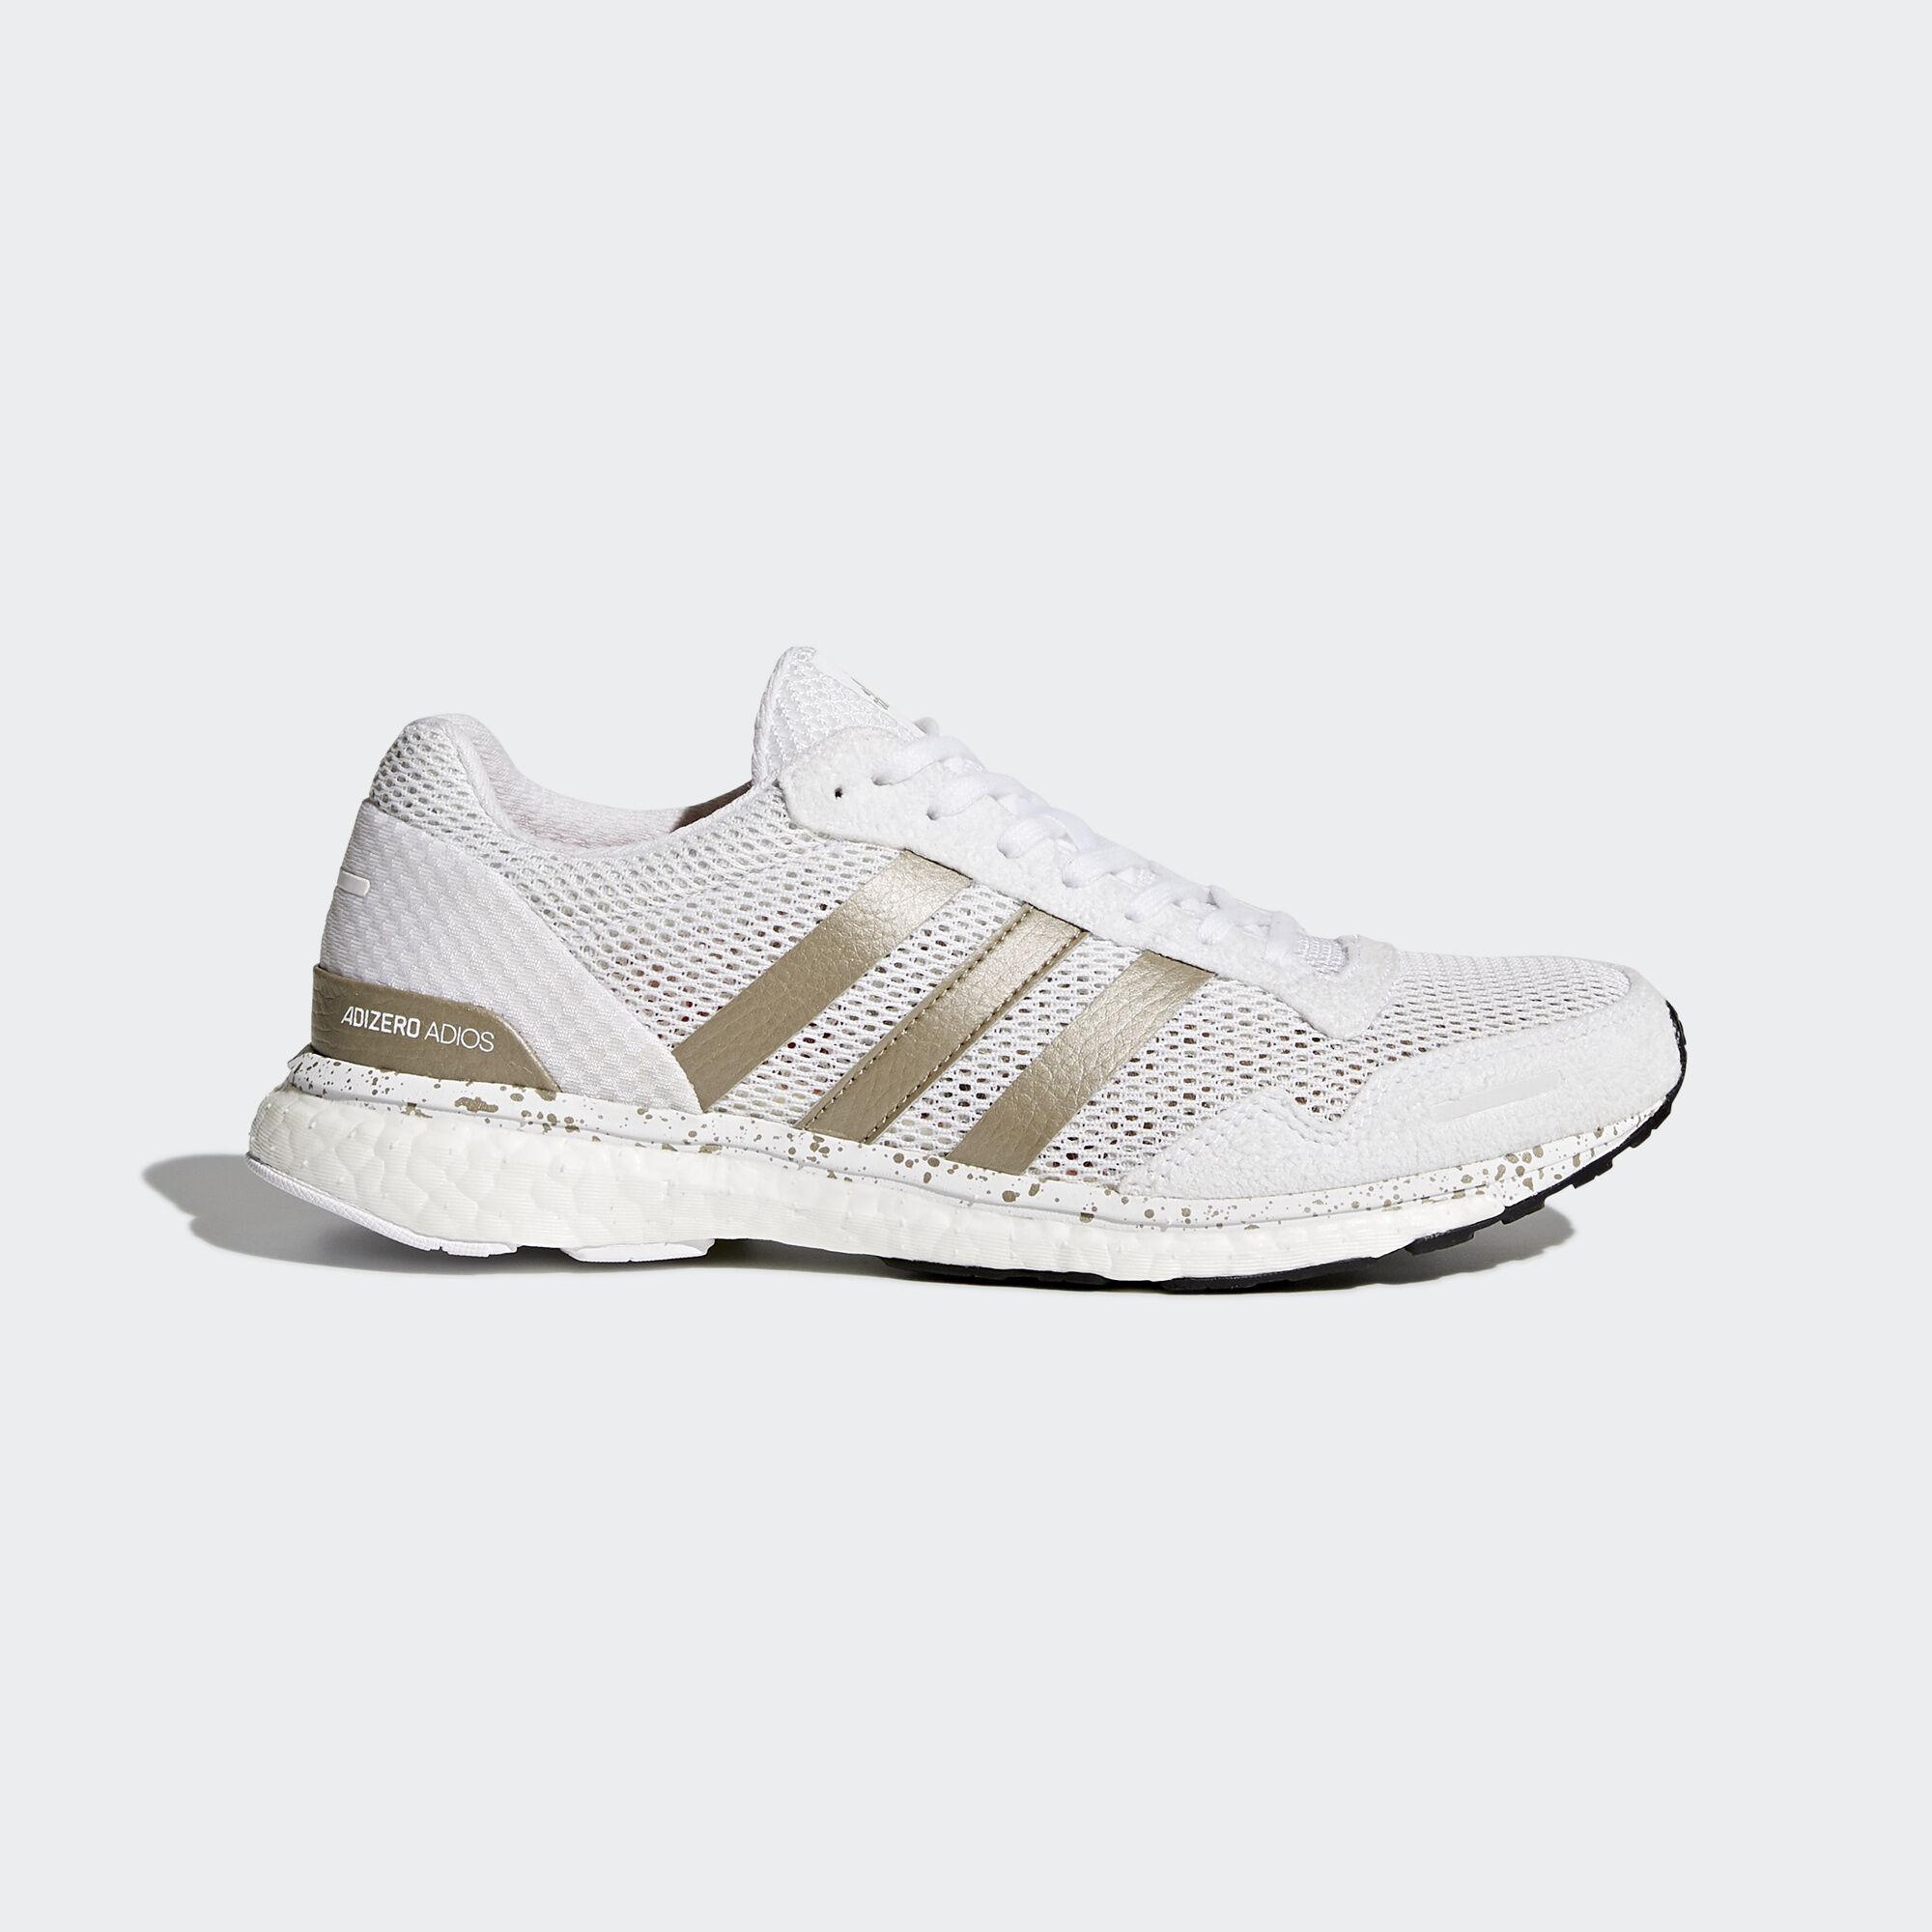 adidas - adizero Adios 3 Shoes Ftwr White/Cyber Metallic/Core Black BB6409.  Women Running